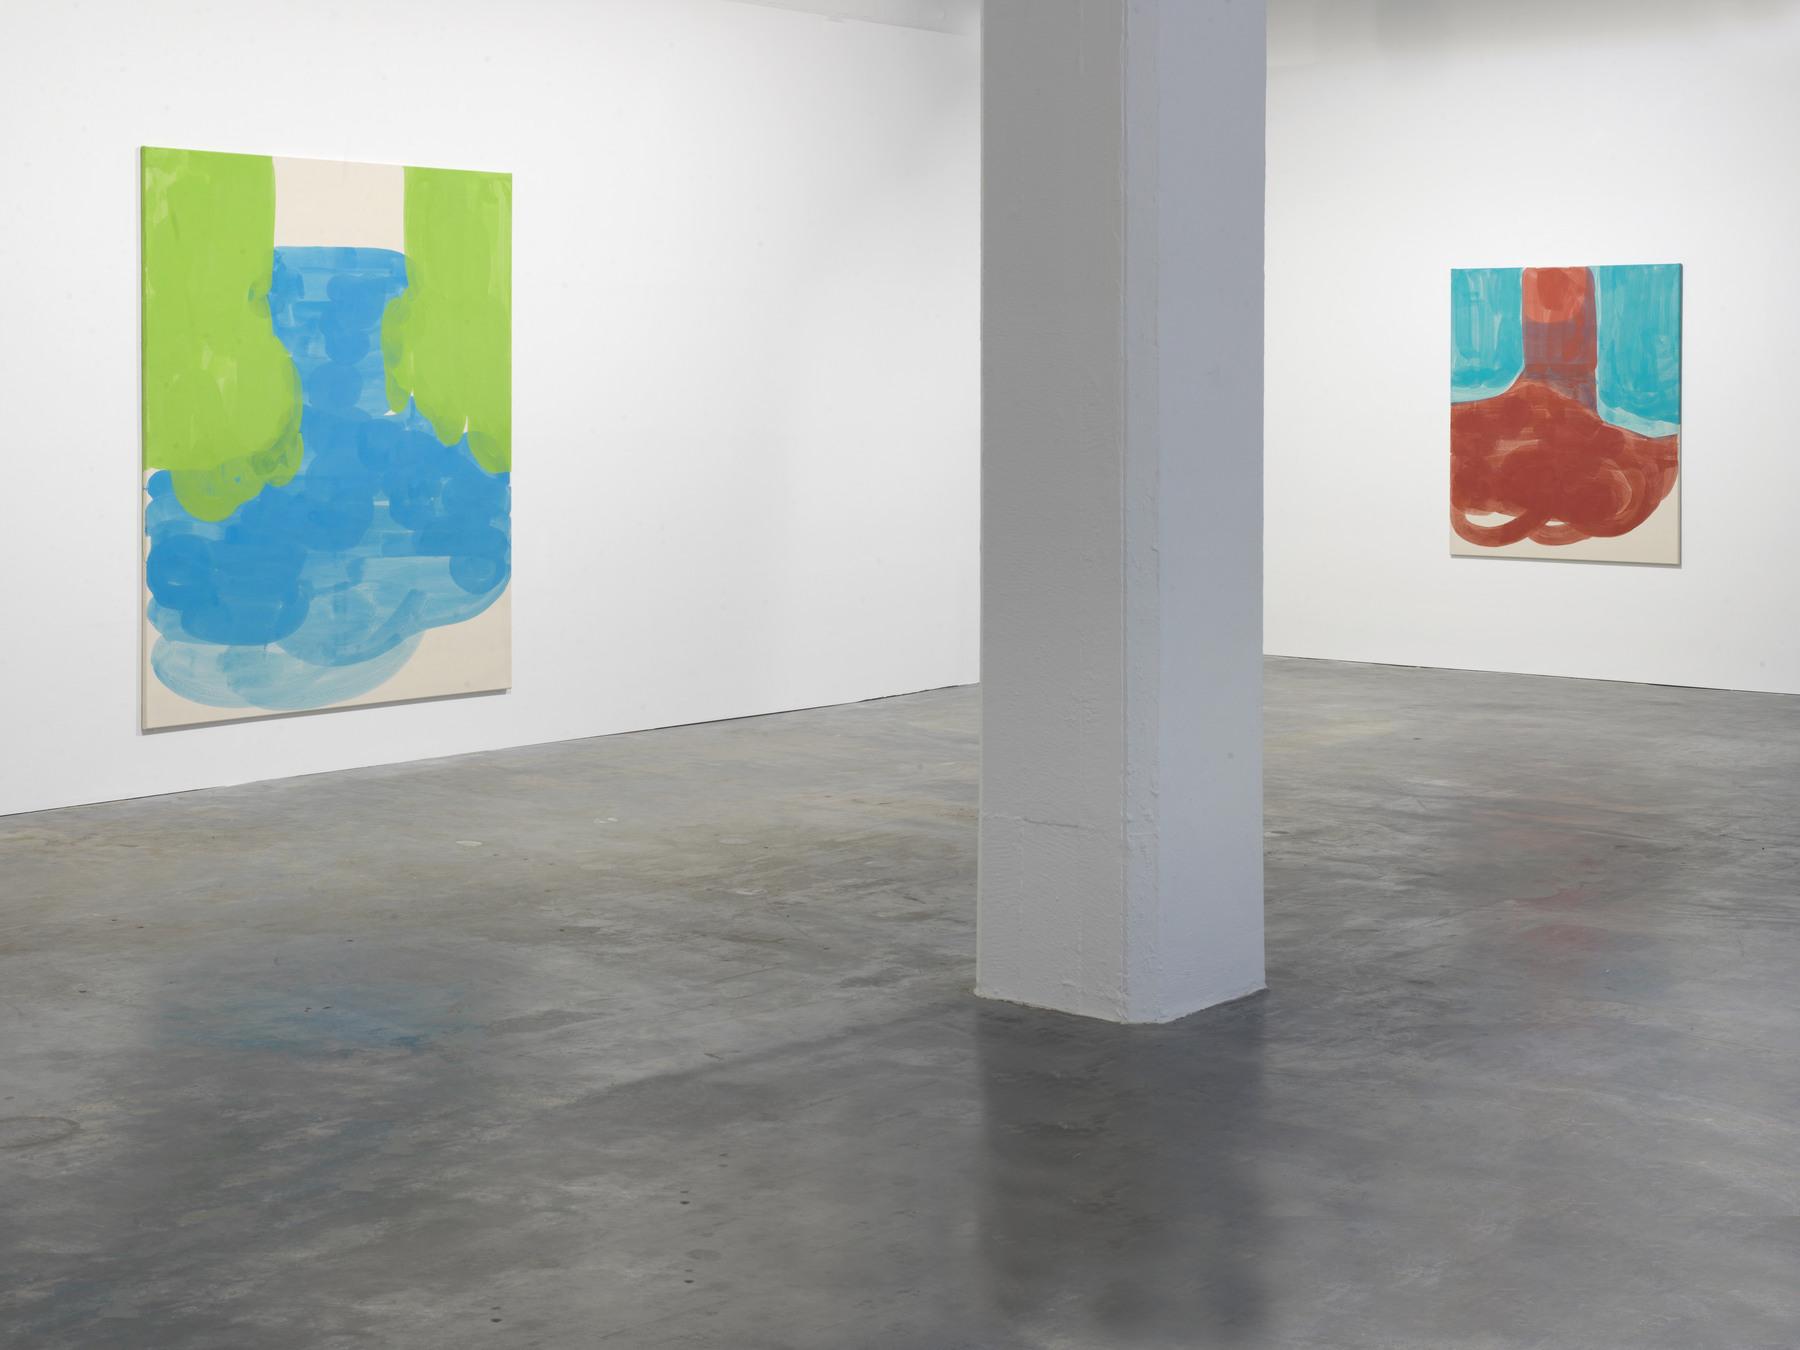 Tamina Amadyar_10,000 hours_Galerie Guido W. Baudach, Berlin_07